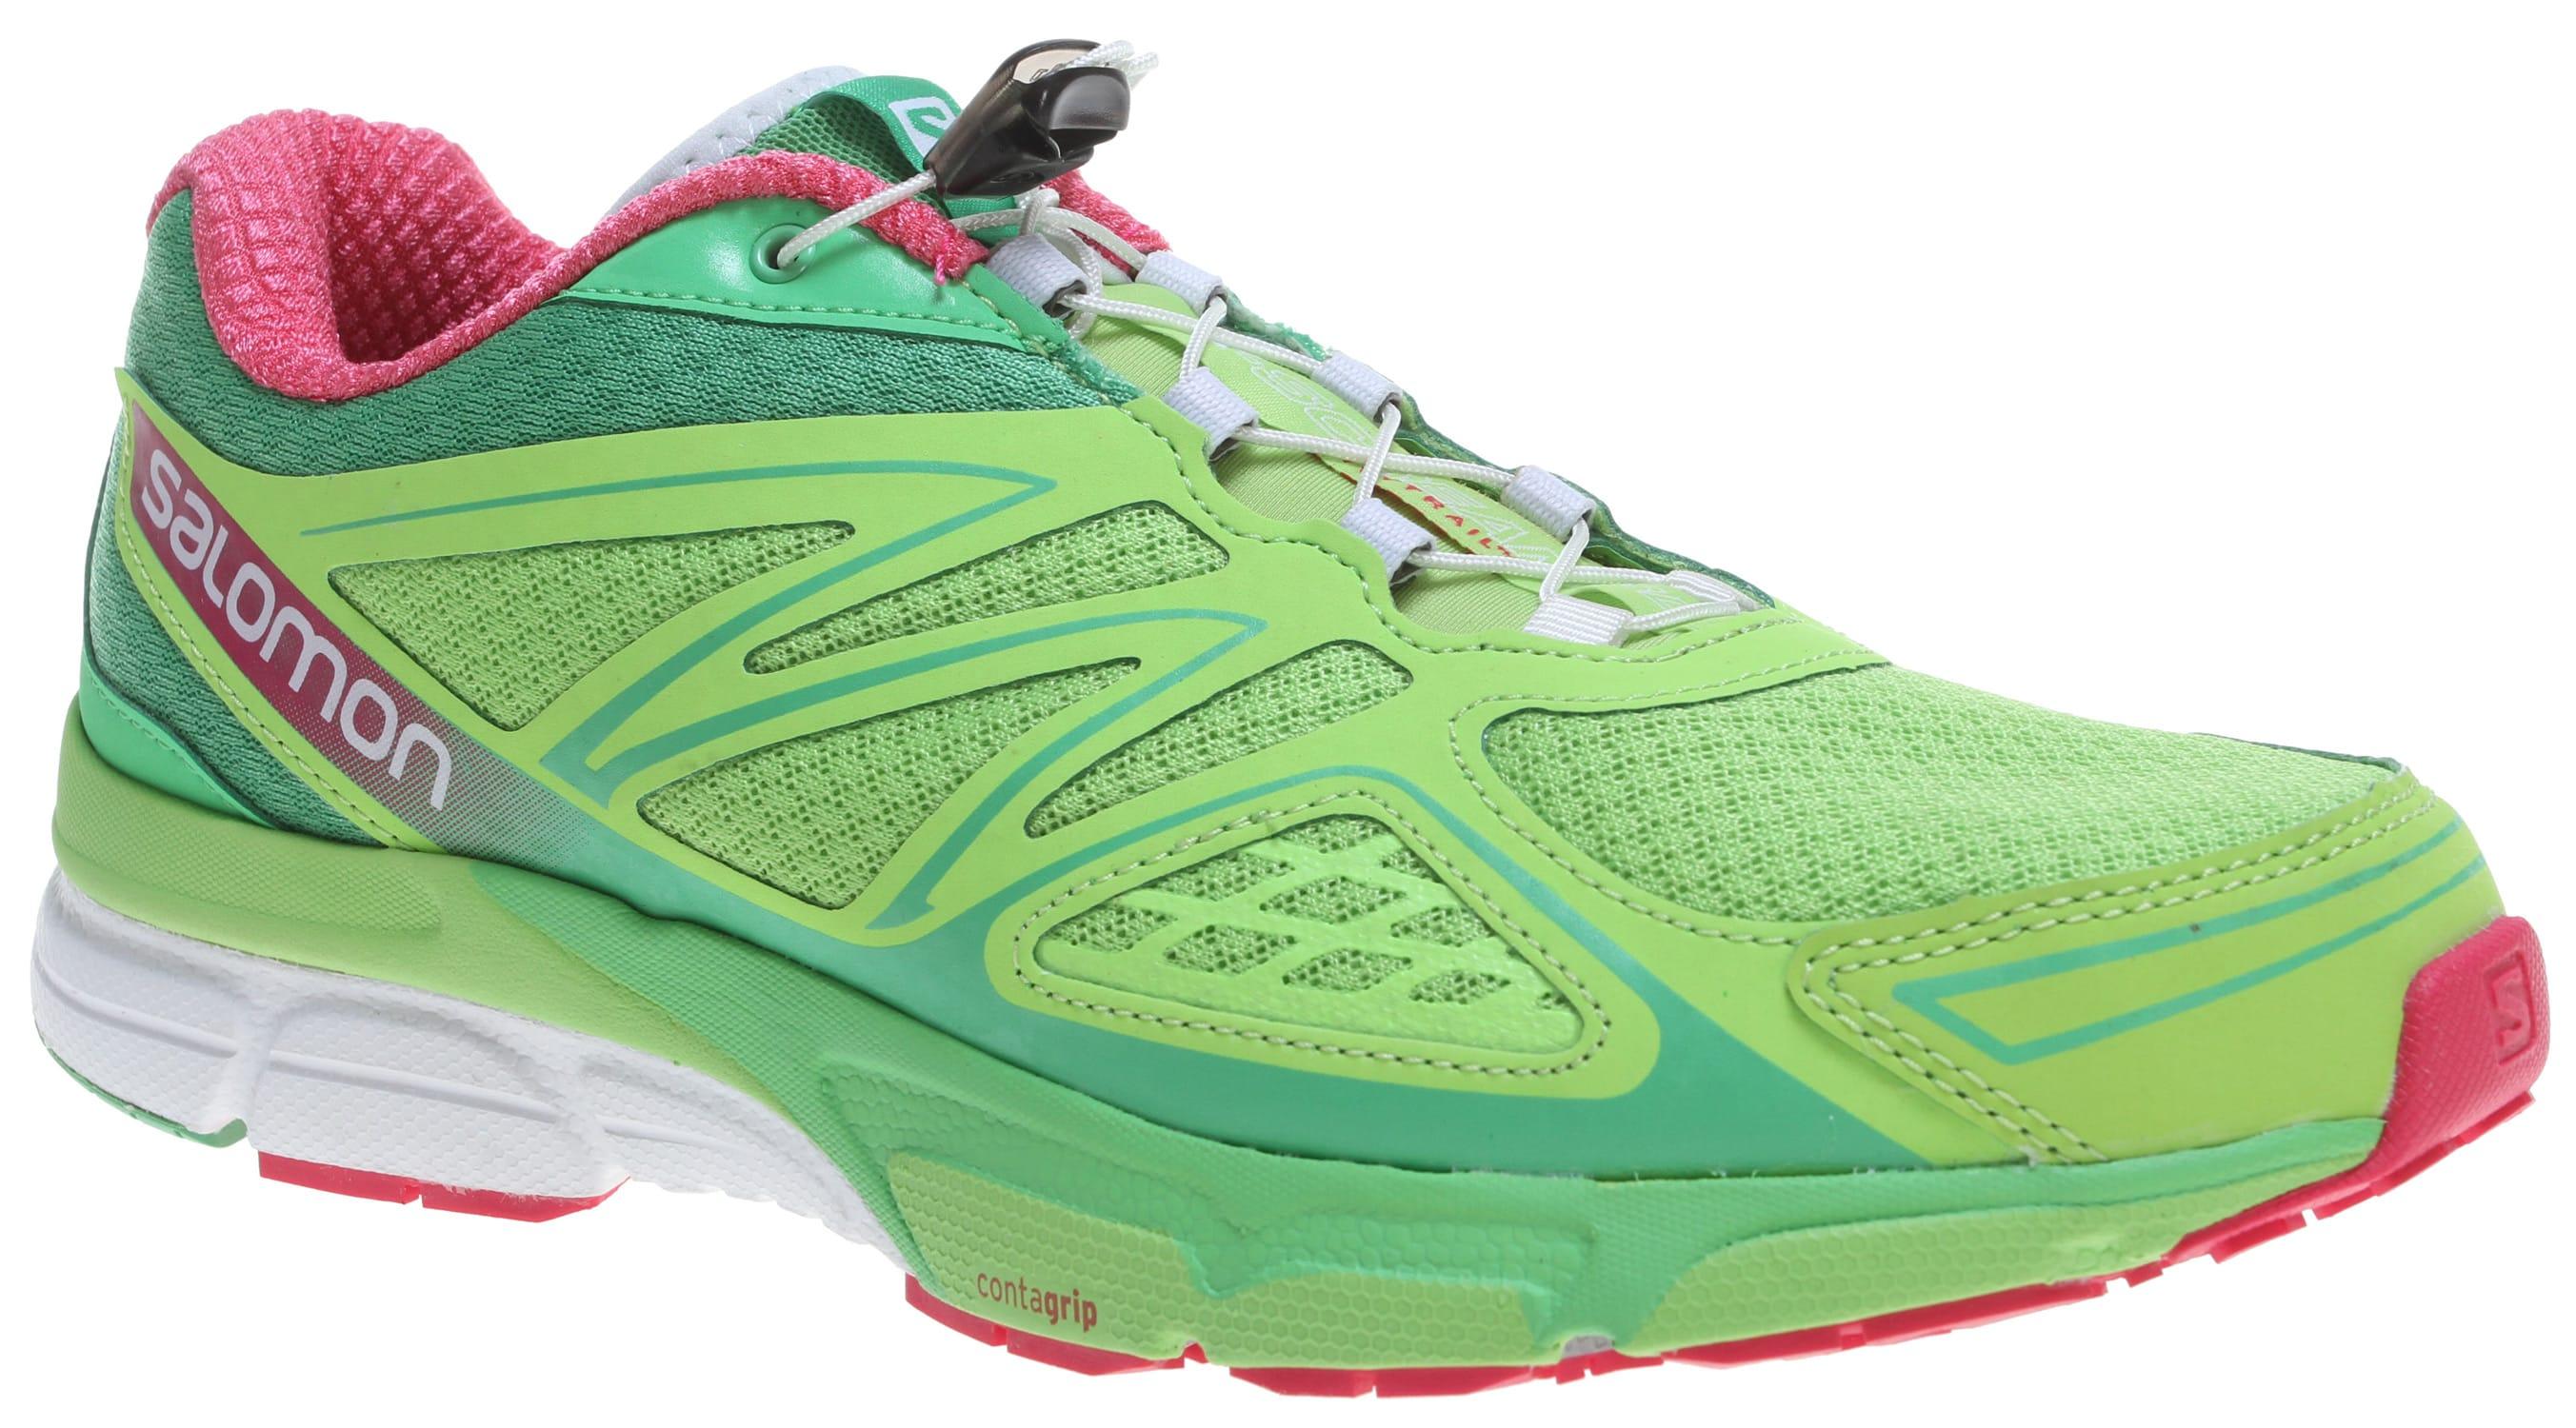 Salomon X Scream Wasabi Running Shoes